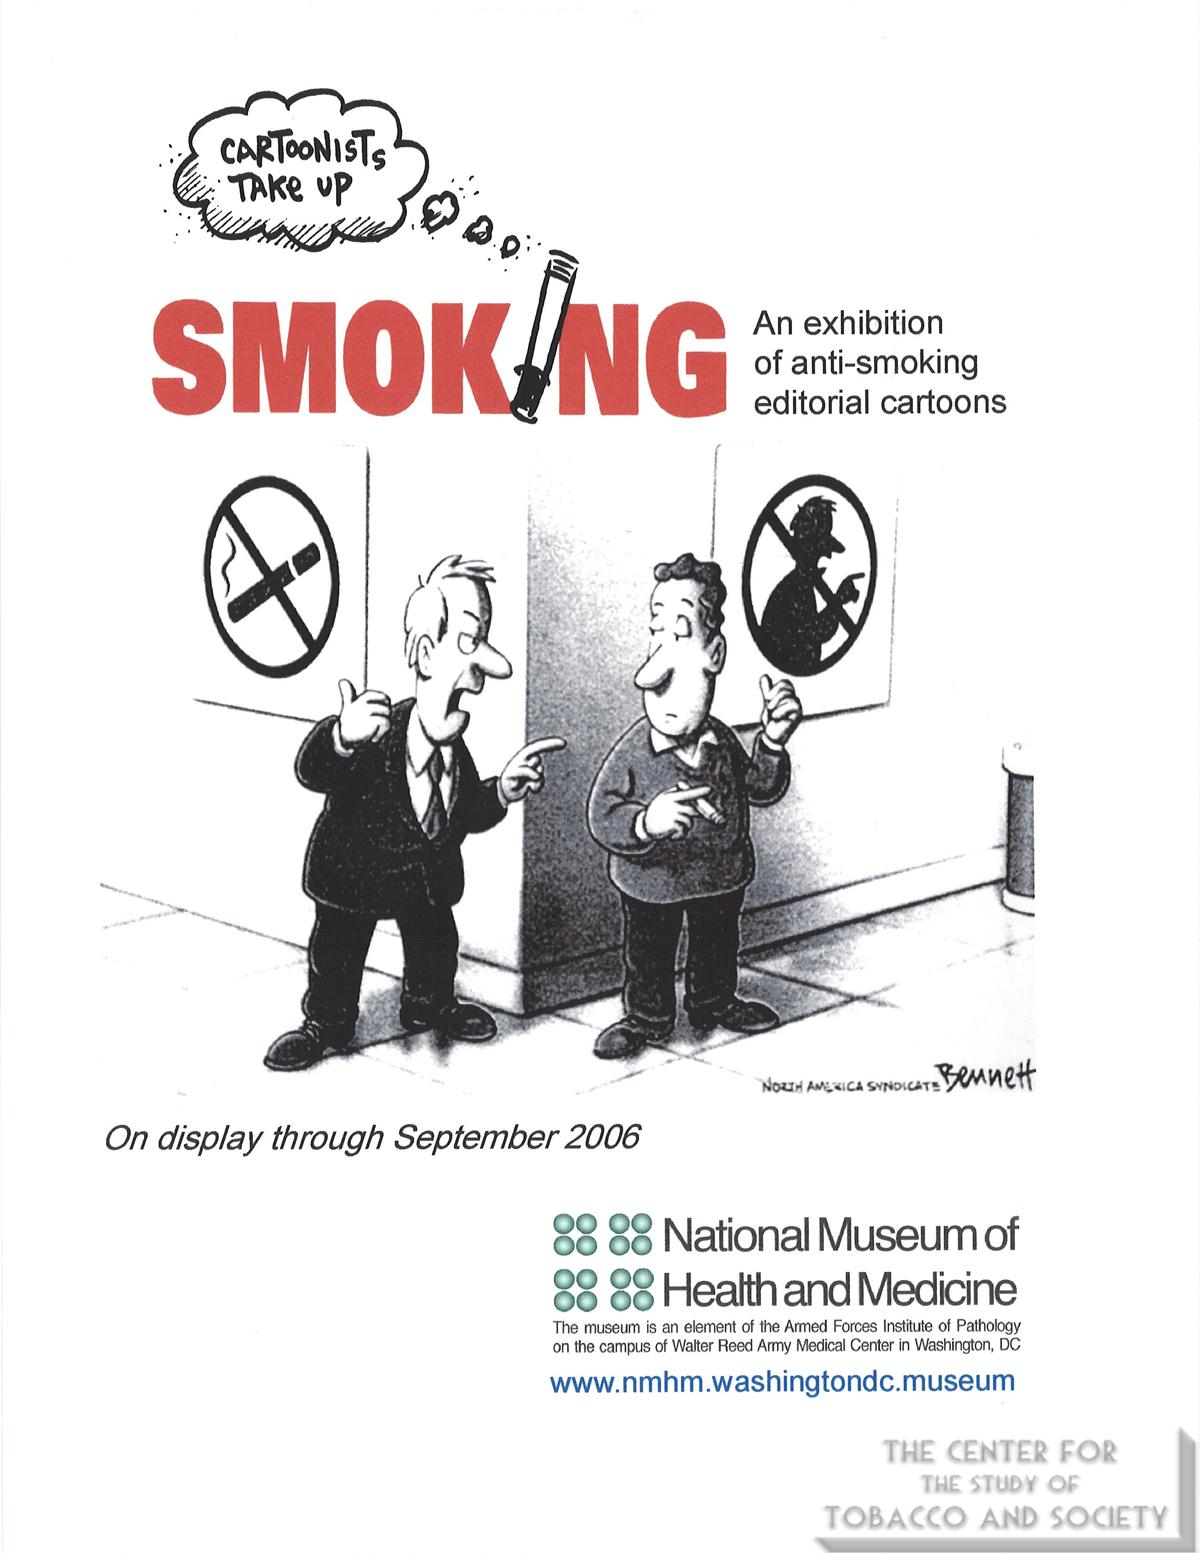 2006 09 Cartoonists Take Up Smoking National Musuem of Health and Medicine Flyer